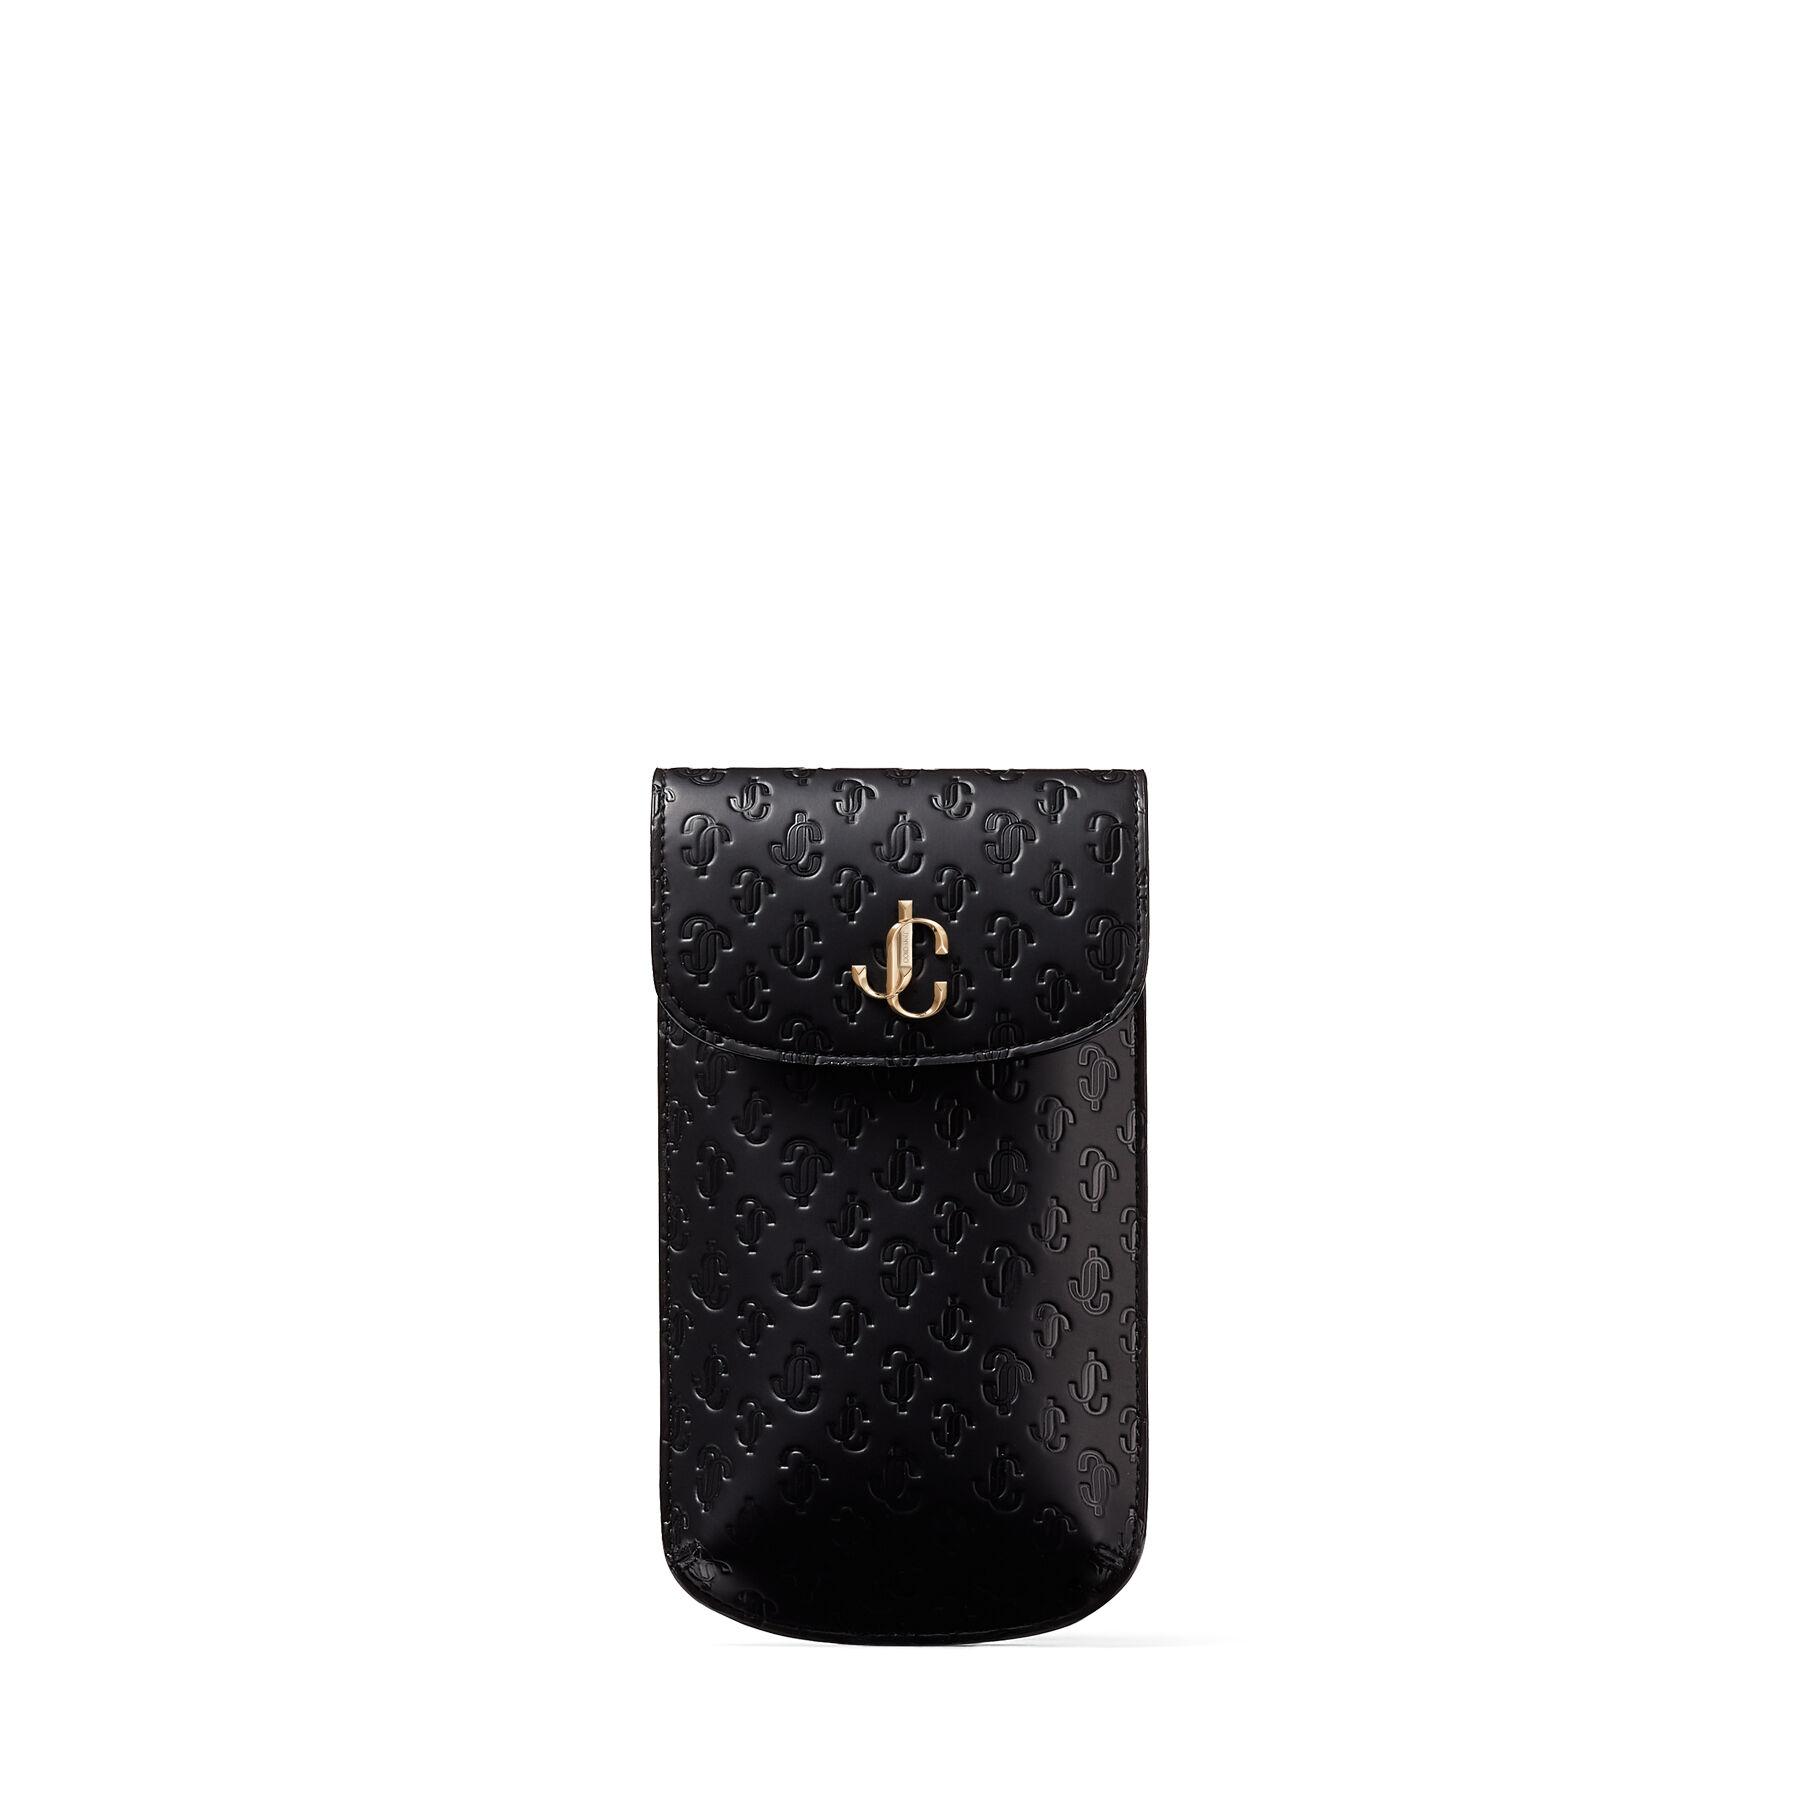 Jimmy Choo Varenne Phone Case  - Black - Size: One Size